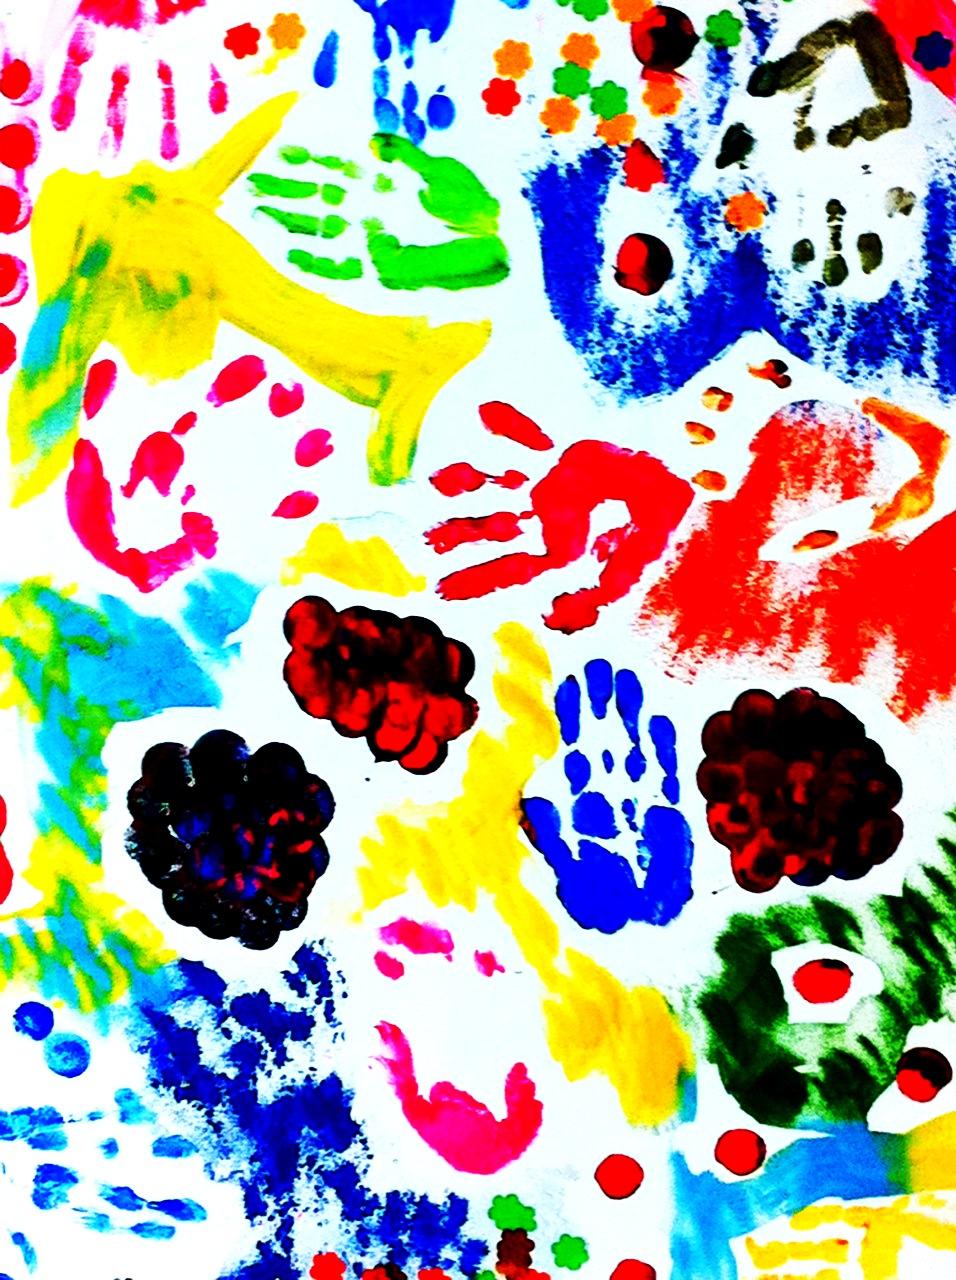 http://leblogdetiti.cowblog.fr/images/Articles/IMG0455.jpg